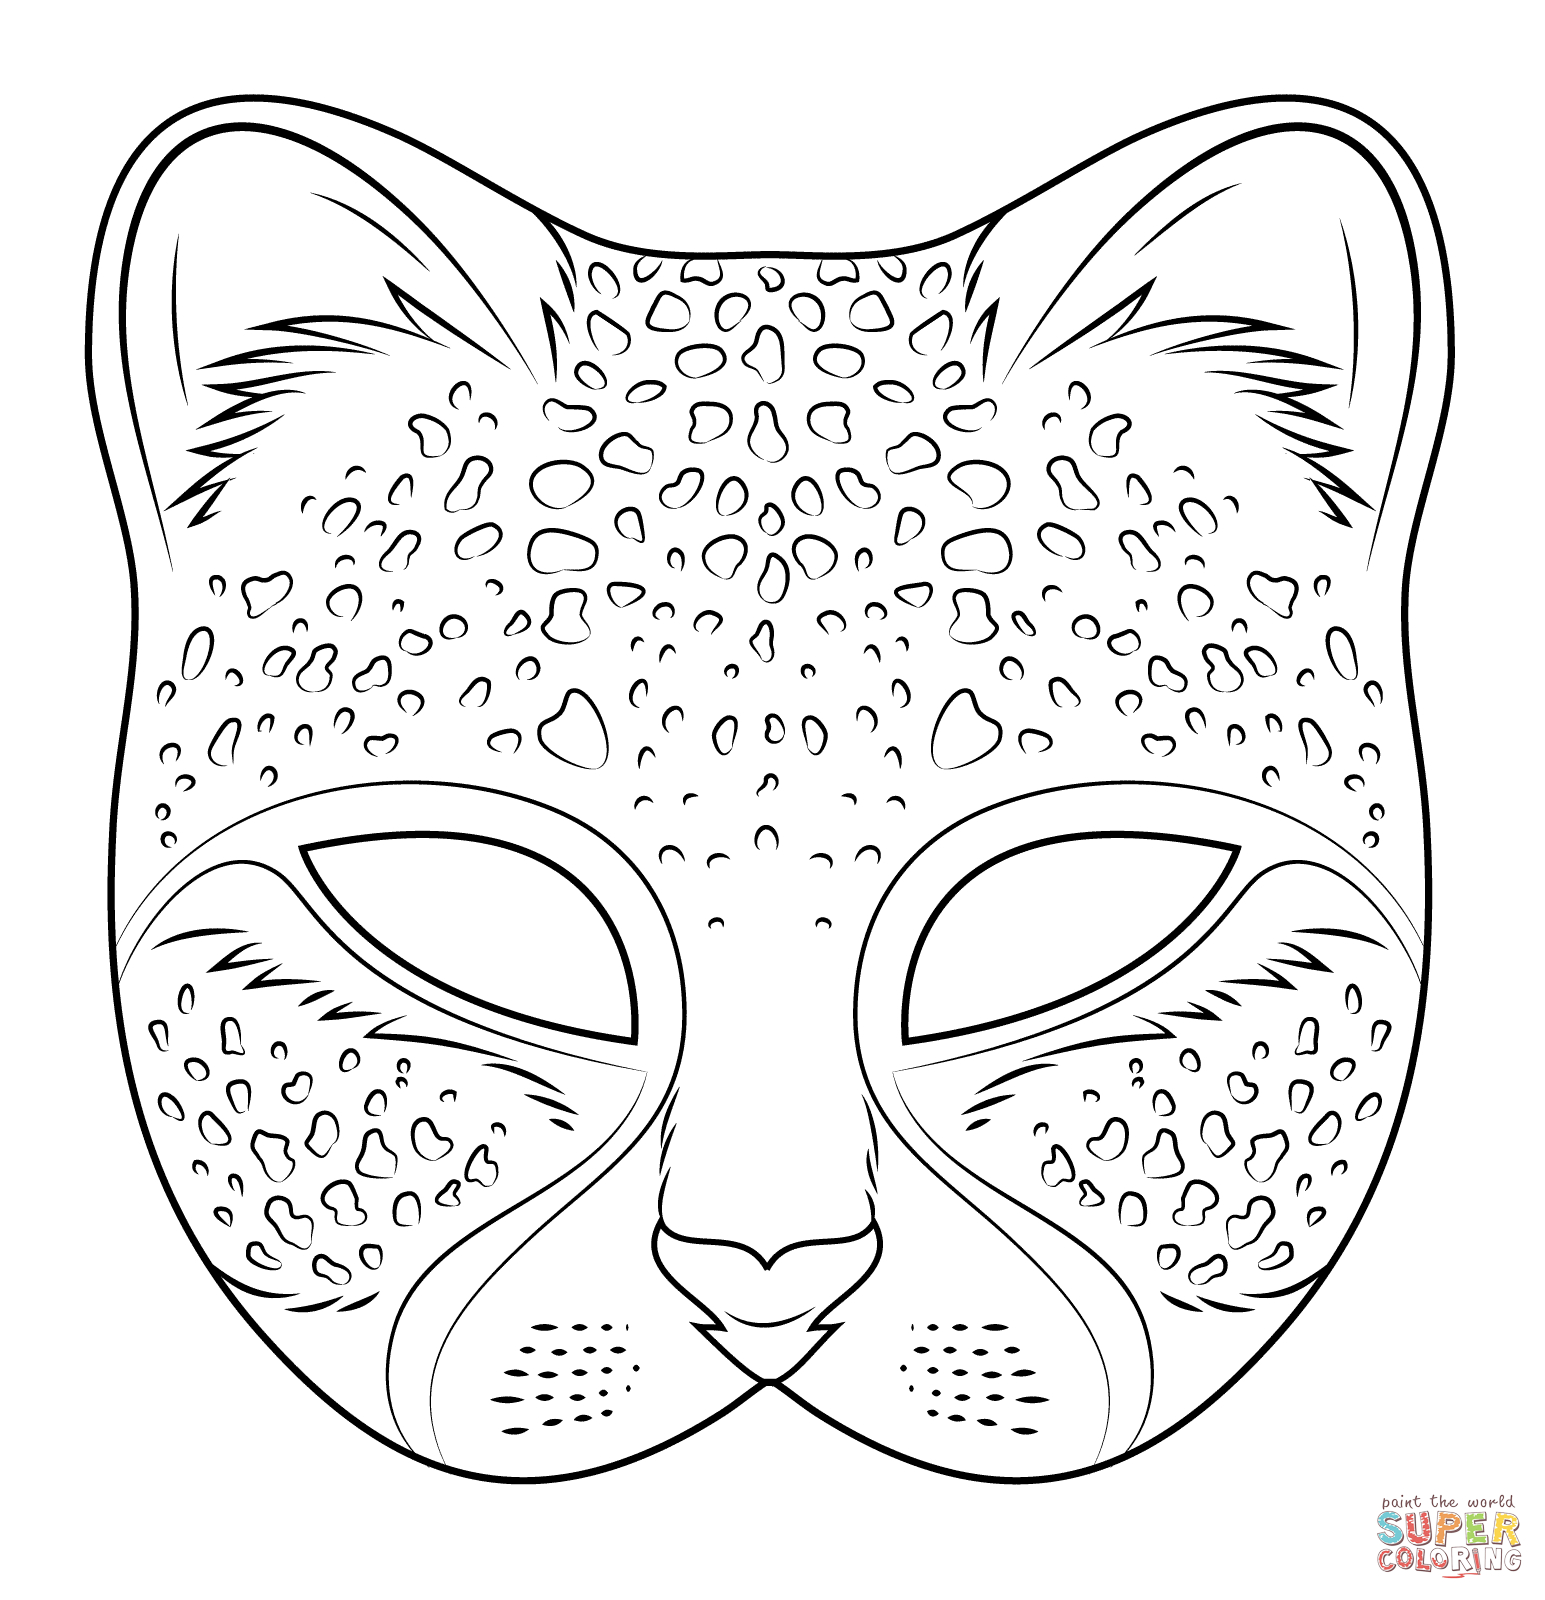 Cheetah Mask | Super Coloring … | Karneval | Pinte… - Animal Face Masks Printable Free